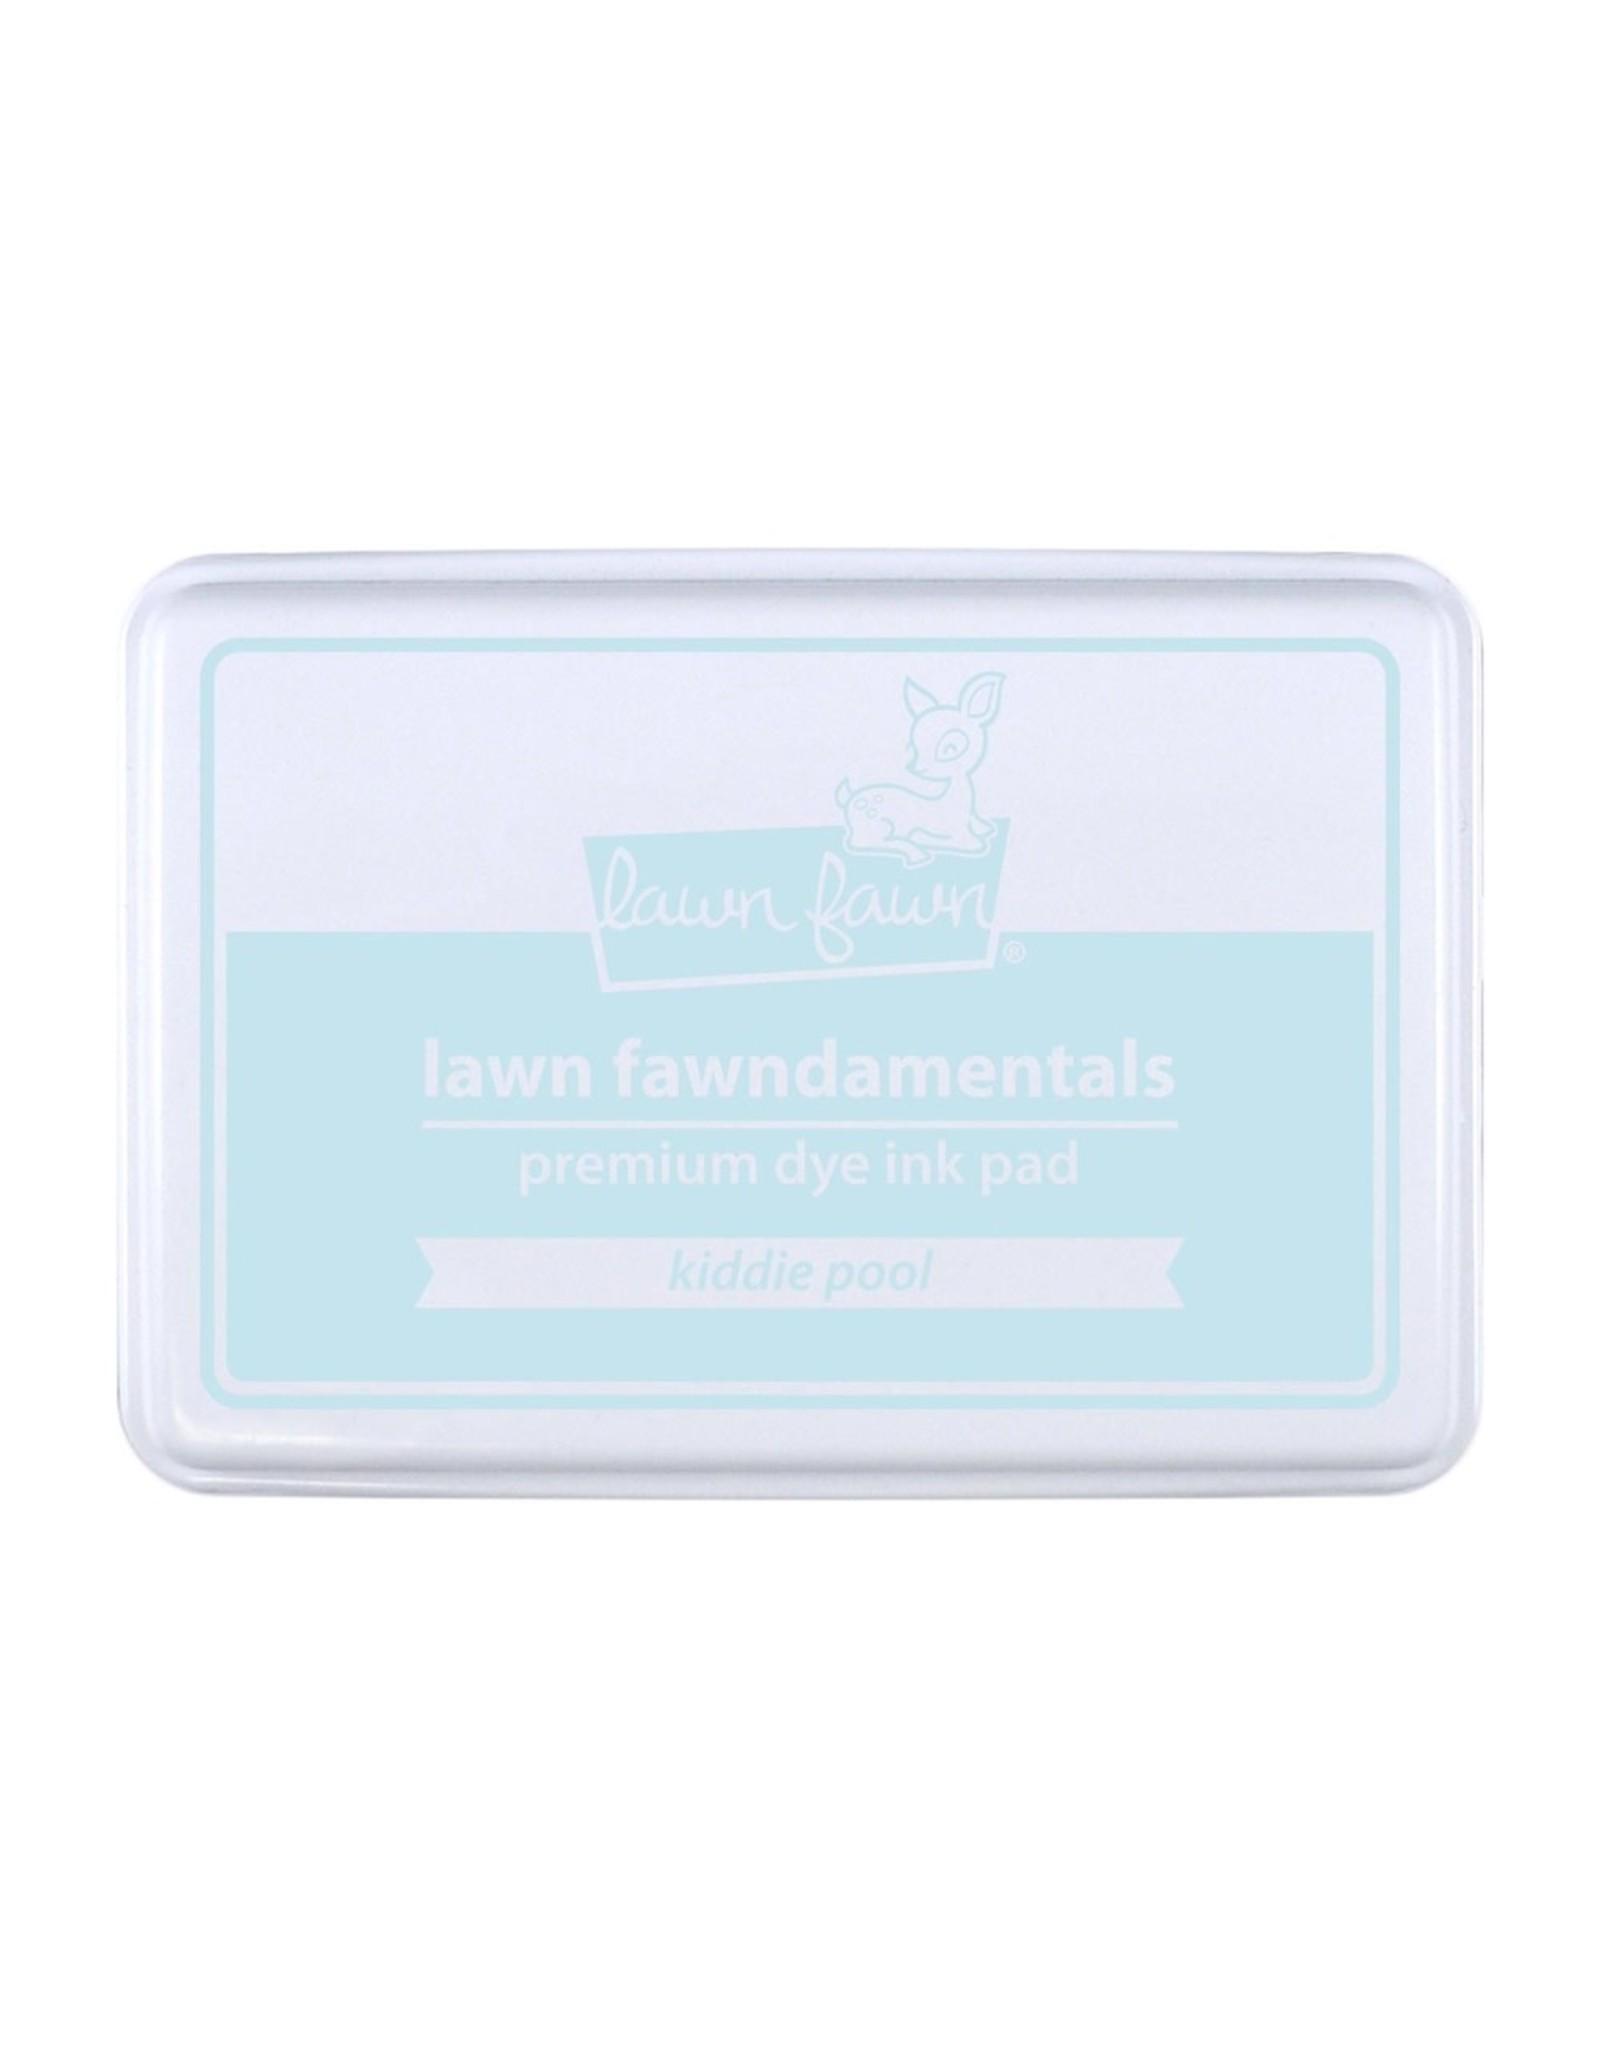 Lawn Fawn Lawn Fawndamentals Dye Ink Pad - Kiddie Pool